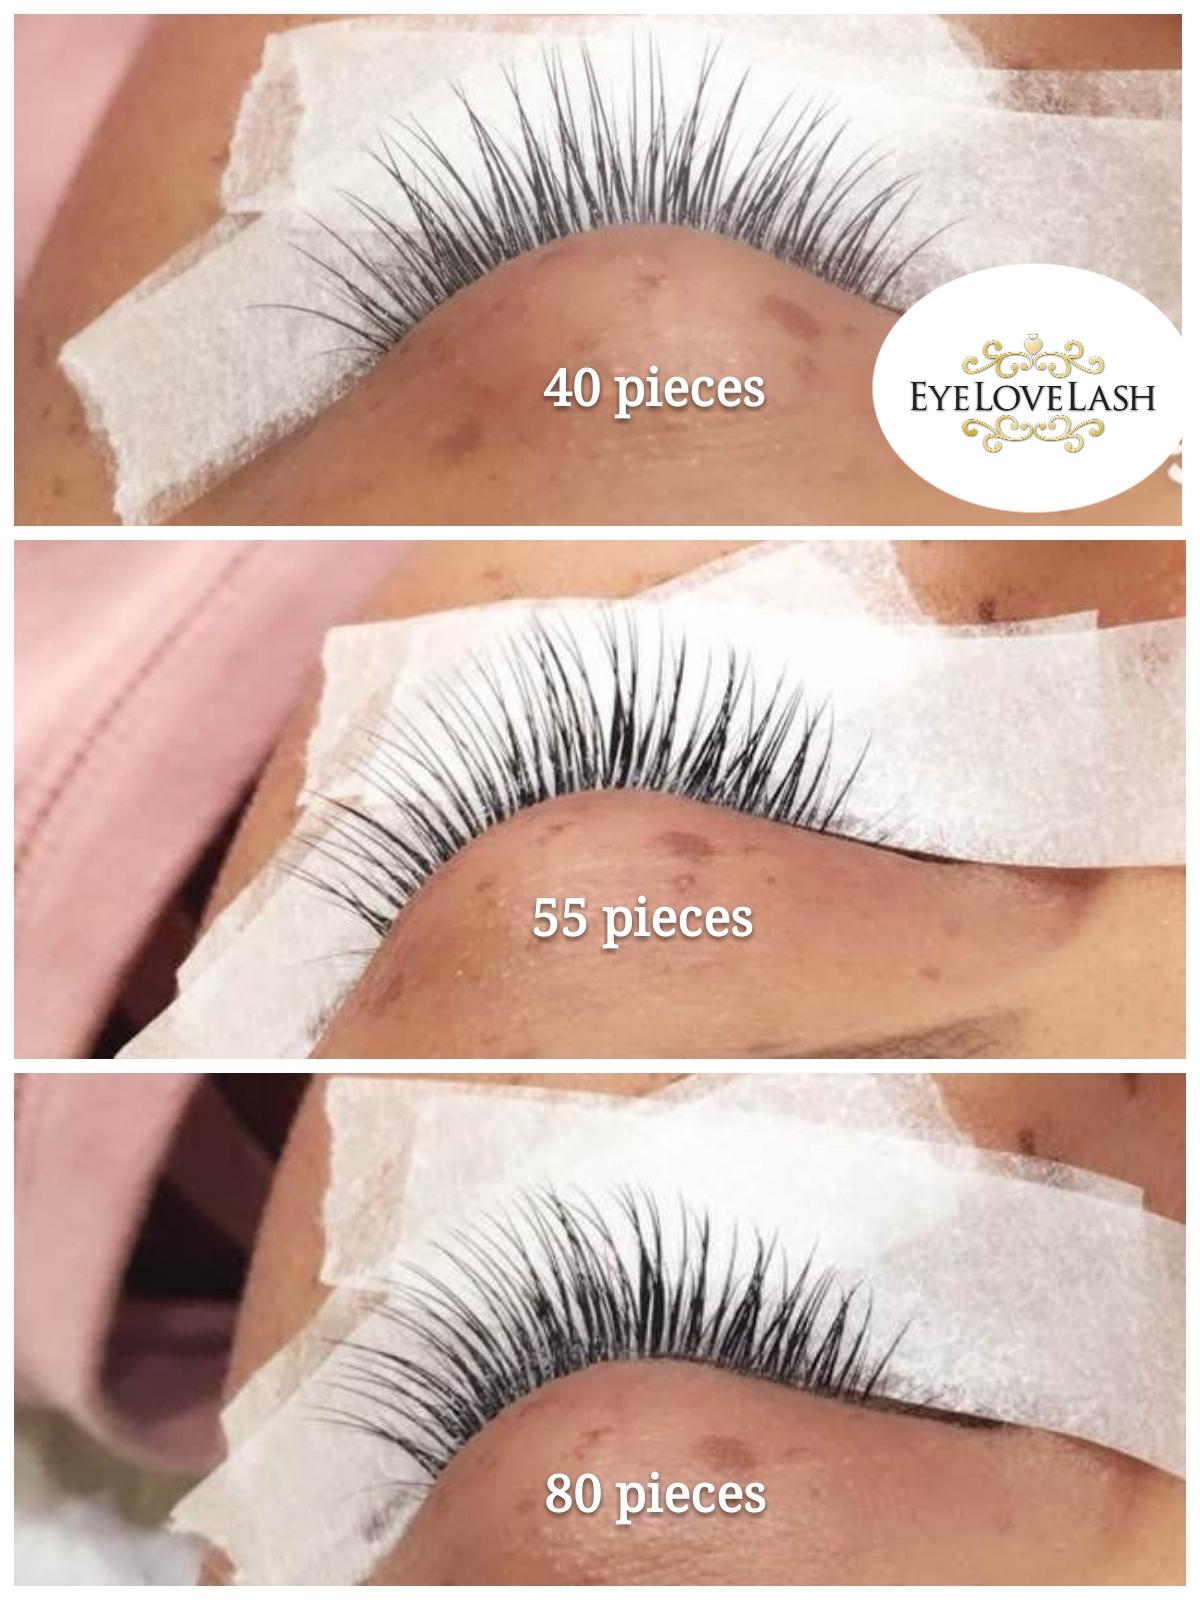 40pc trial Set Best eyelash extension service NYC